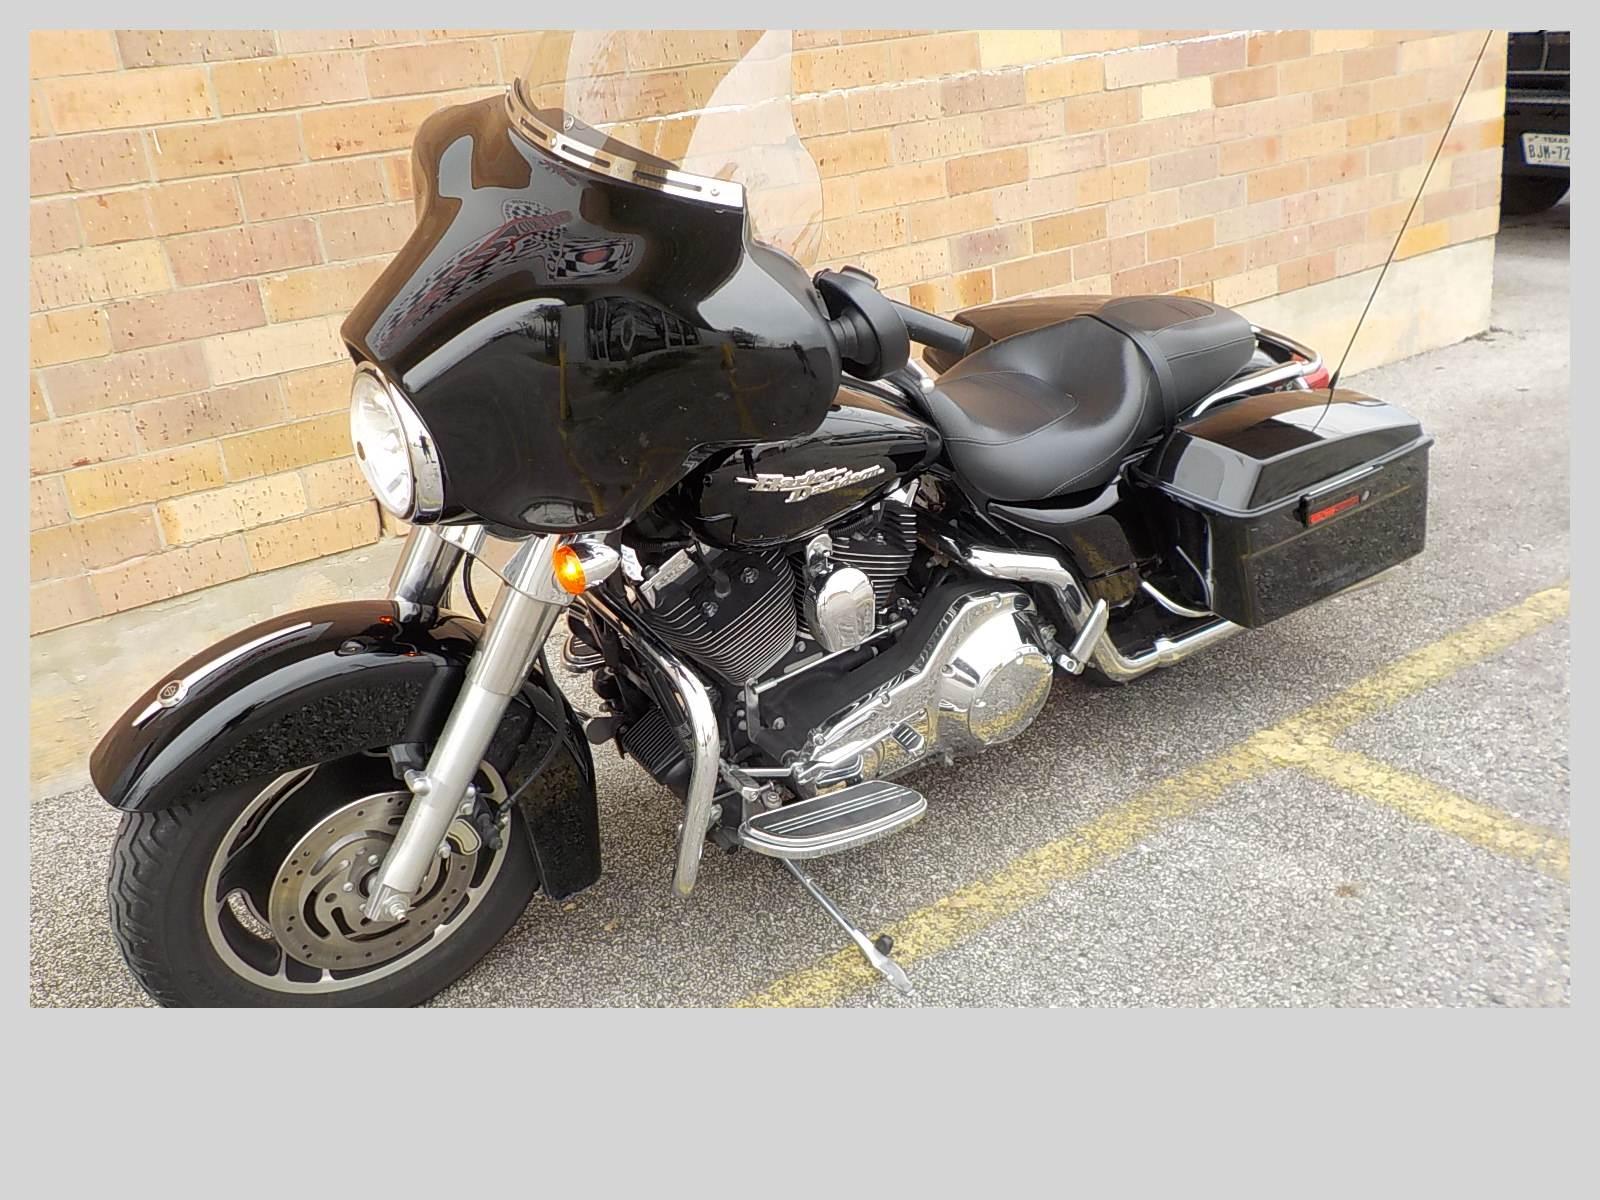 2006 Harley-Davidson Street Glide 4